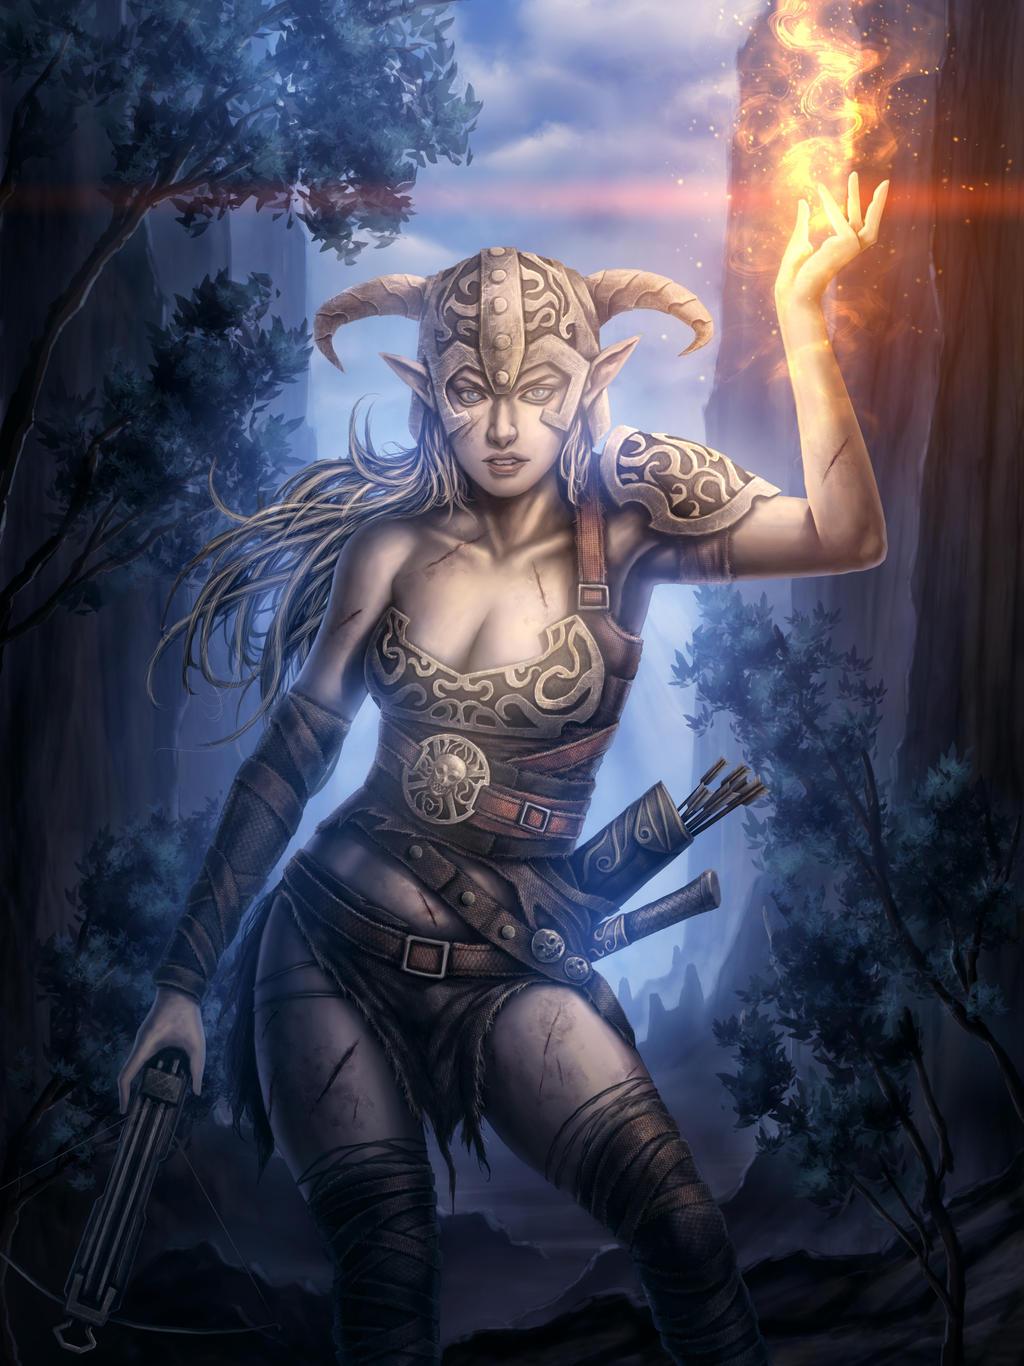 The Elder Scrolls V Skyrim Fanart By Tekkoontan On Deviantart